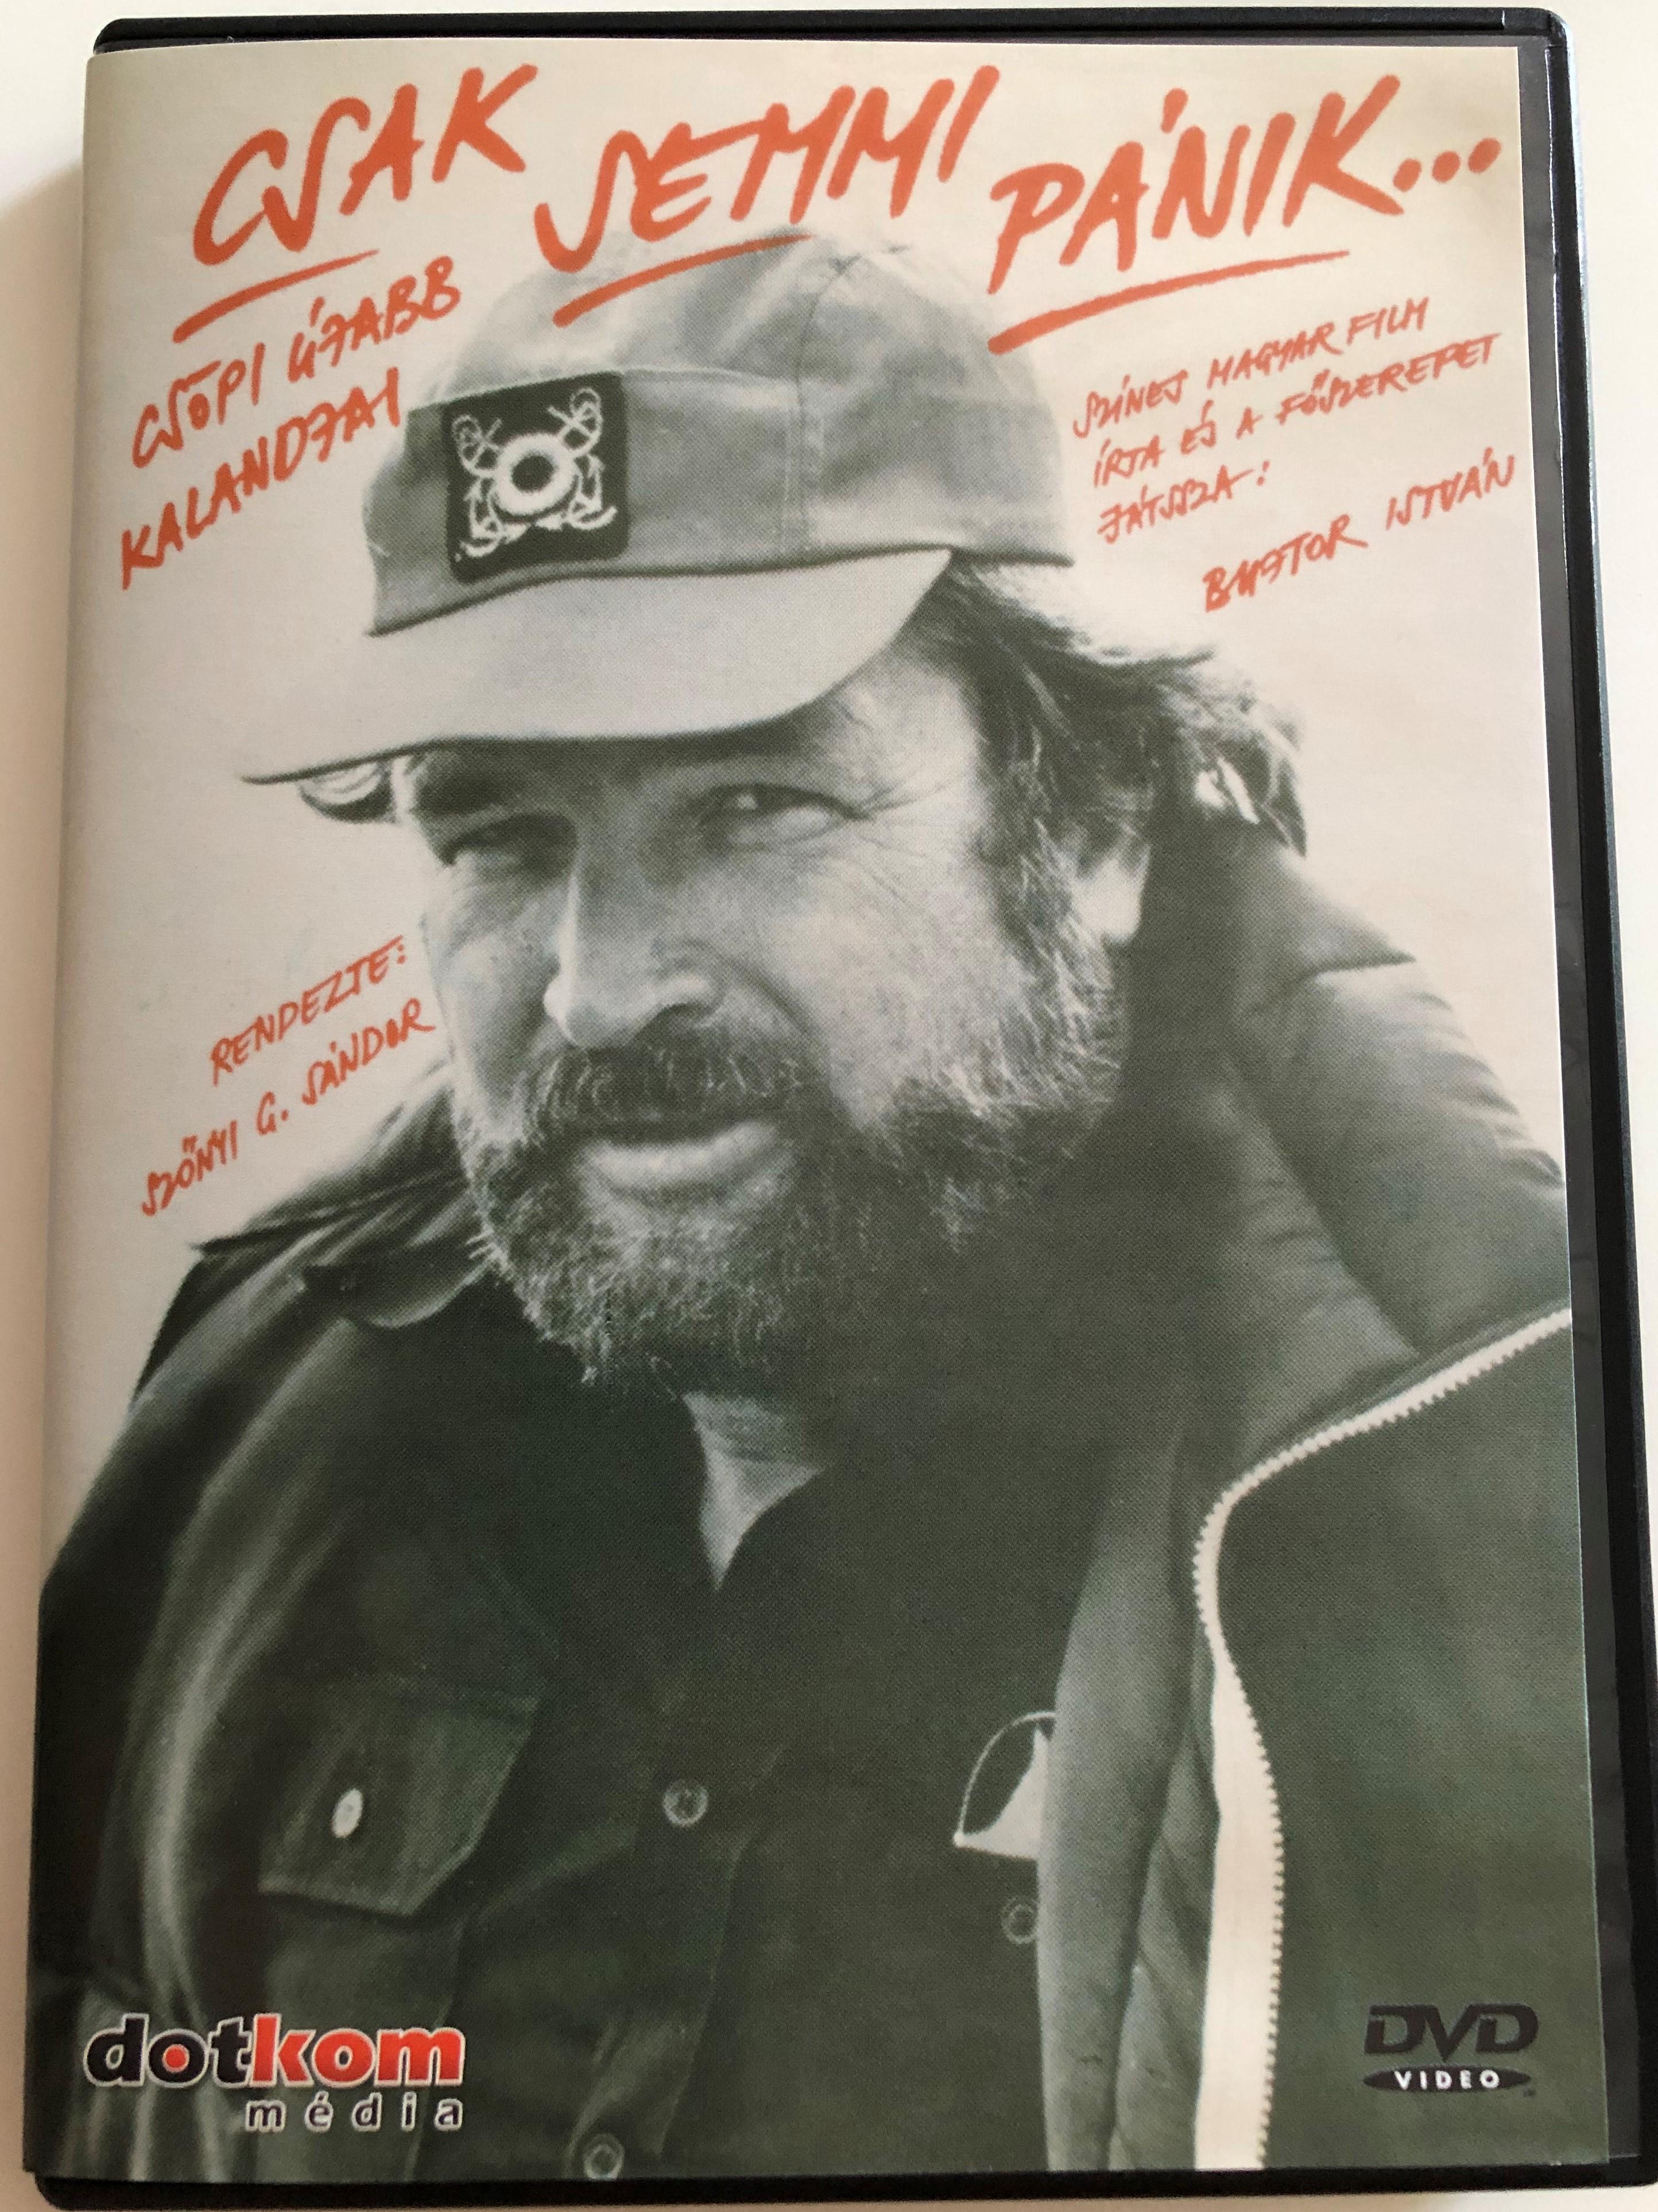 csak-semmi-p-nik-dvd-1982-do-not-panic-major-kardos-directed-by-sz-nyi-g.-s-ndor-starring-bujtor-istv-n-kern-andr-s-sz-khelyi-j-zsef-bodrogi-gyula-hungarian-action-comedy-1-.jpg